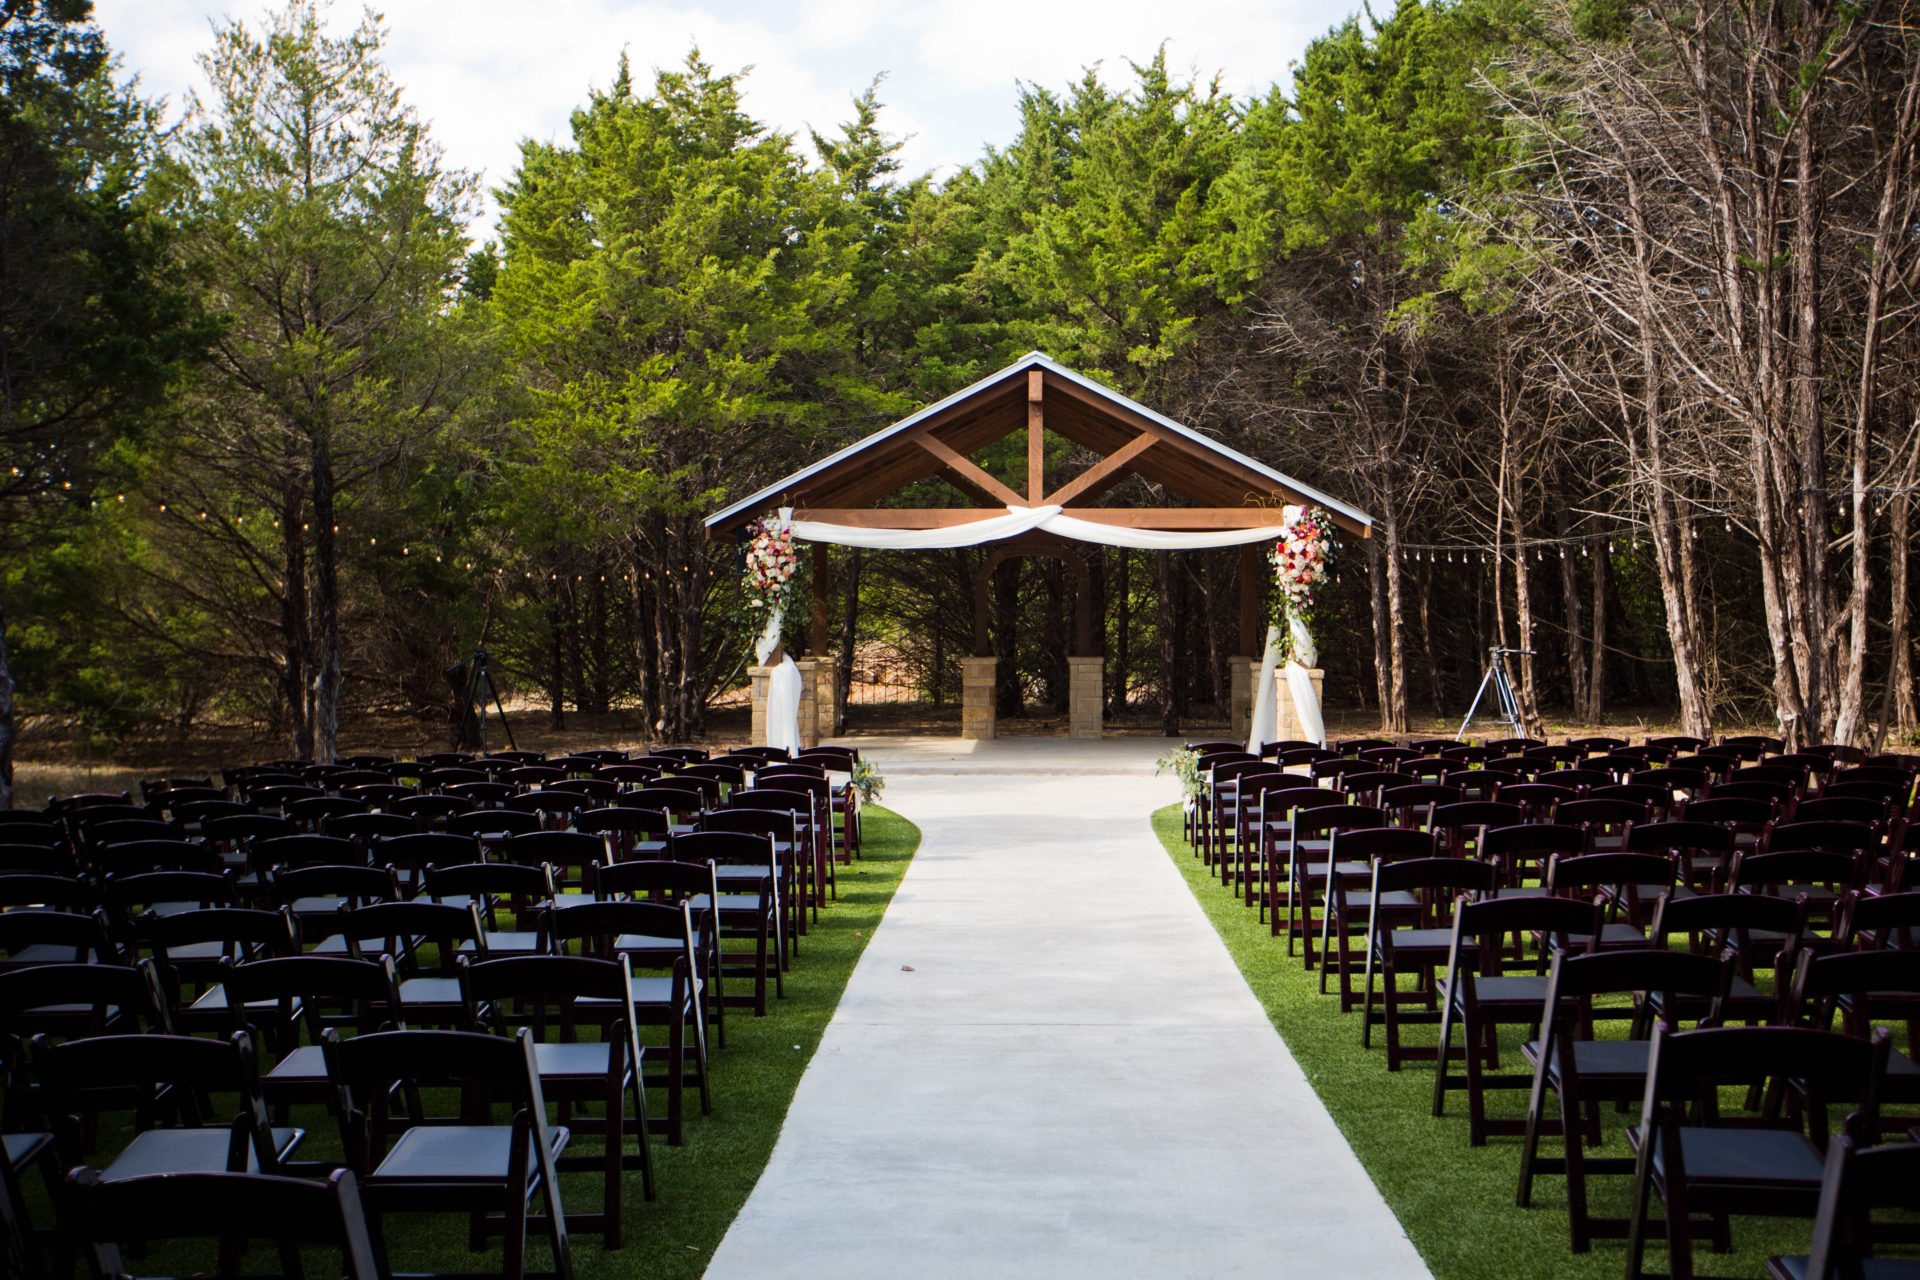 wedding venue dfw